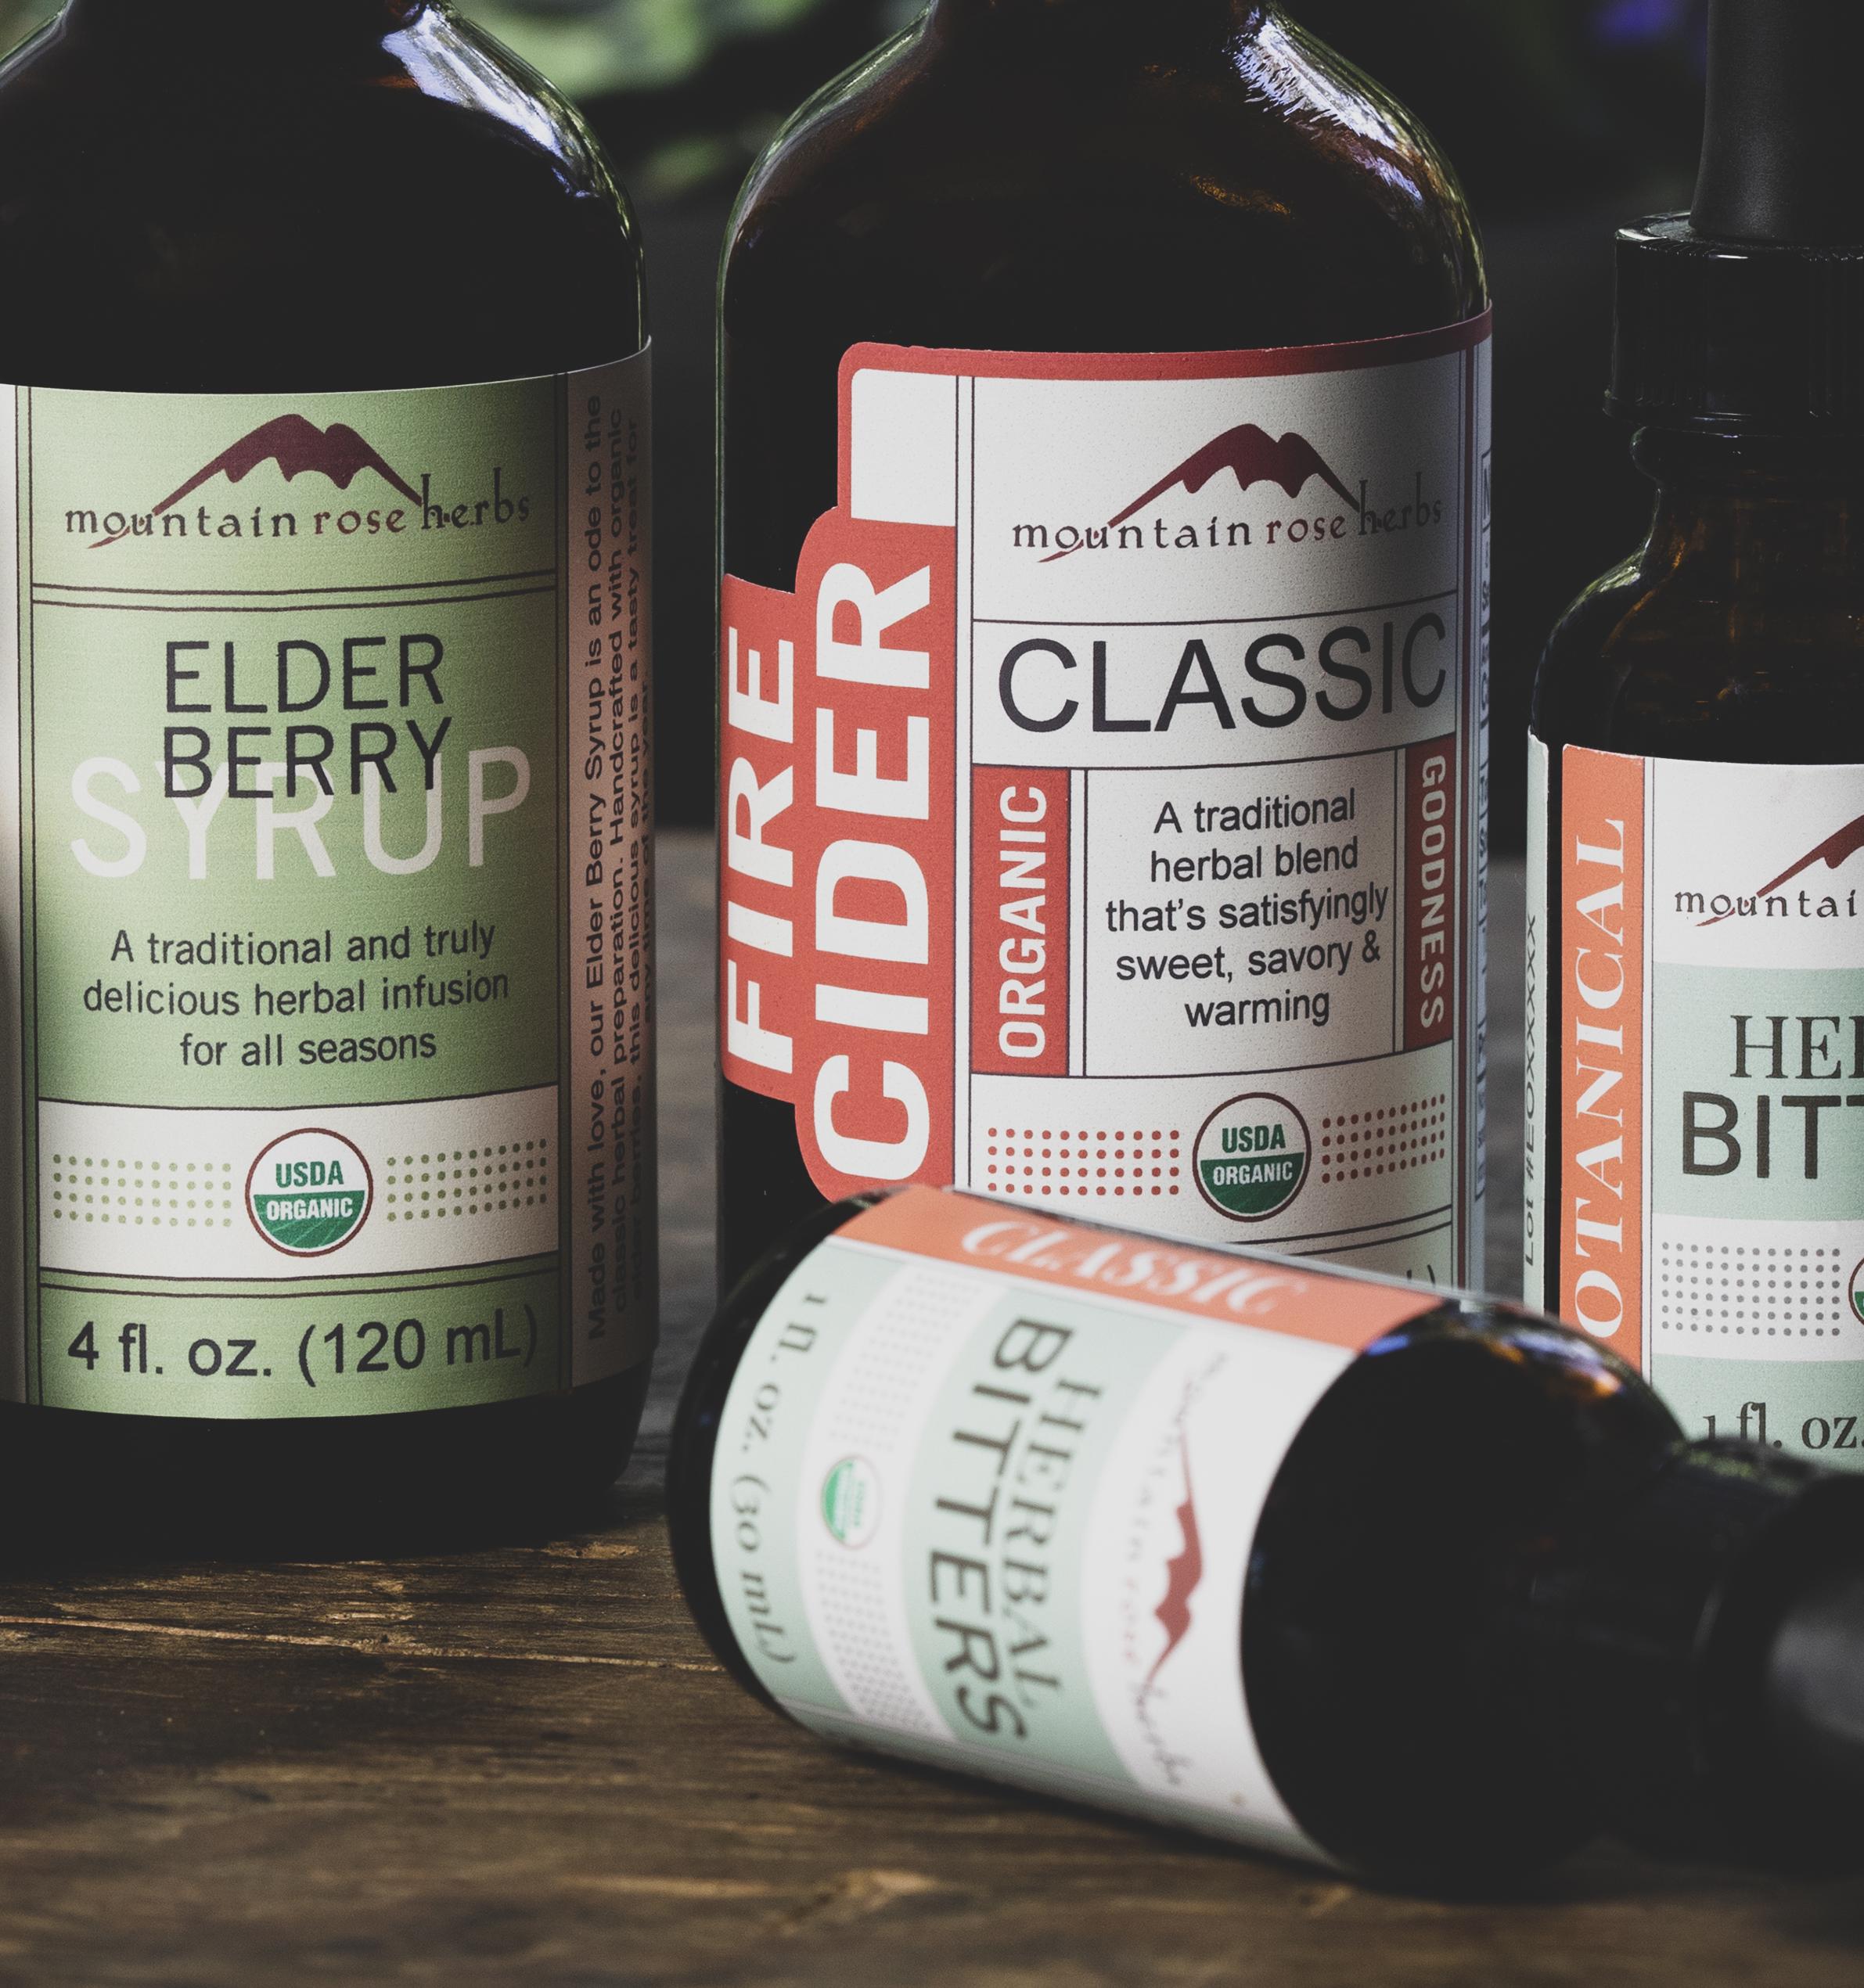 bitters-tonics-and-syrups-sq.jpg